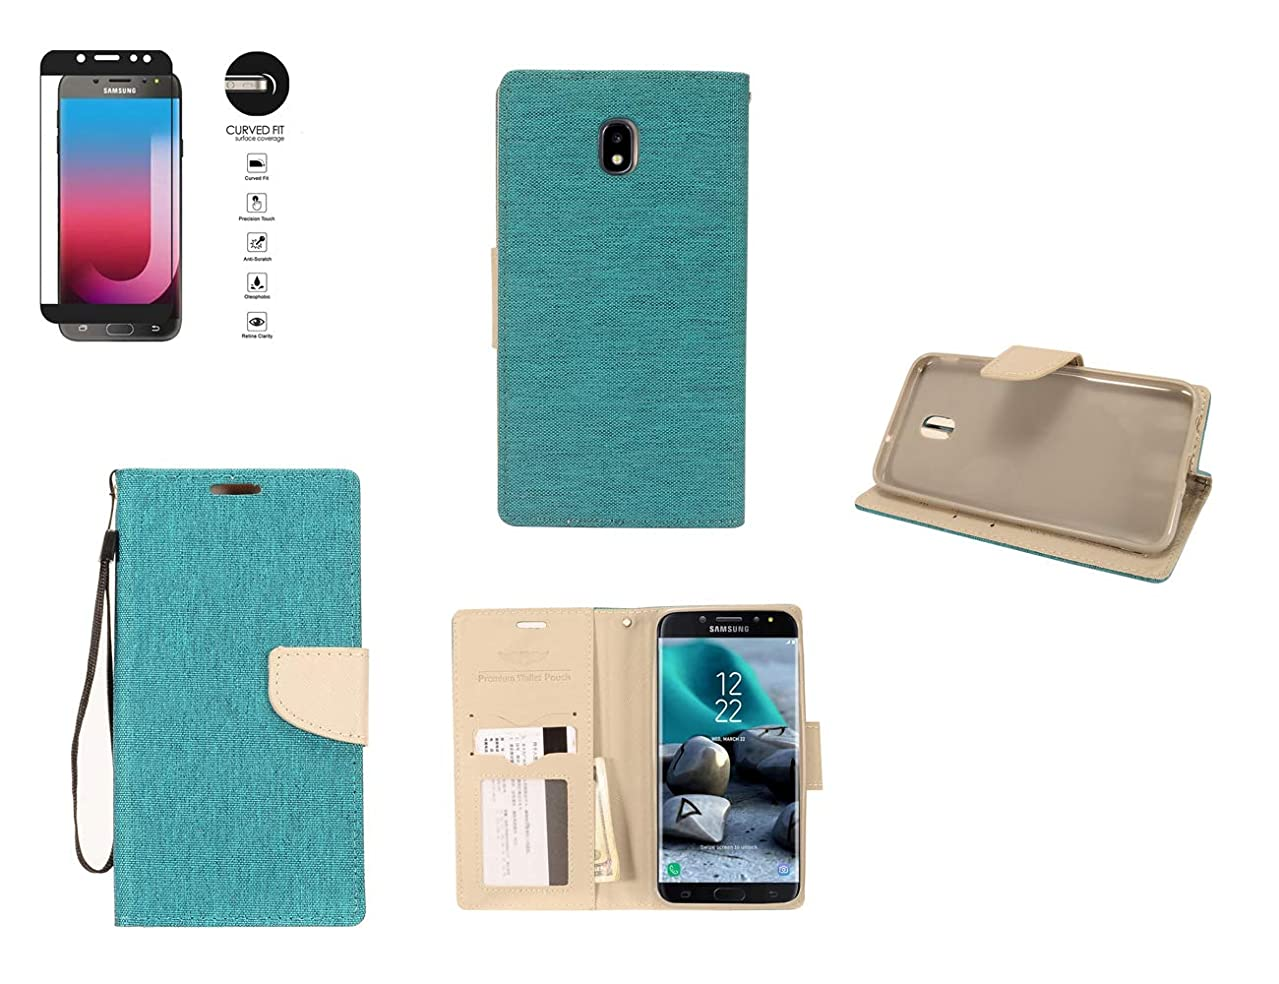 Tempered Glass+PU Leather Wallet Case Cover Card for Samsung Galaxy J7 Aero / J7 Aura / J7 Crown / J7 Refine / J7 Star / J7 V 2nd Gen / J737 / J7 2018 Phone (Teal Grey)